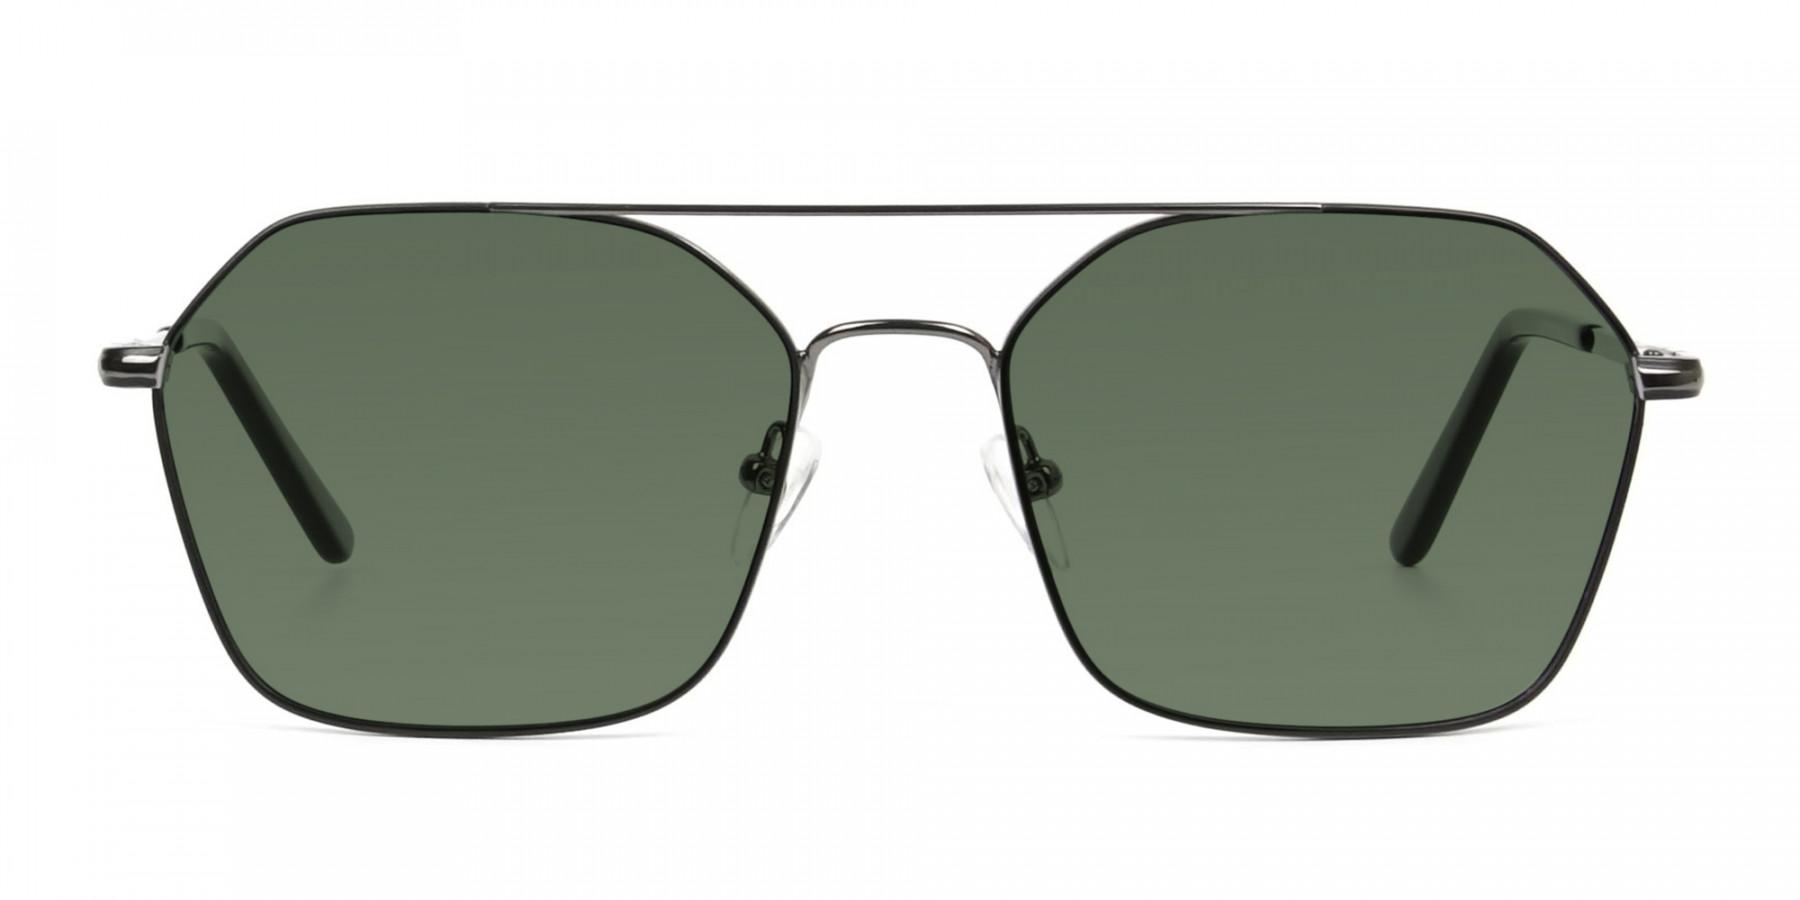 black-geometric-aviator-green-tinted-sunglasses-frames-3